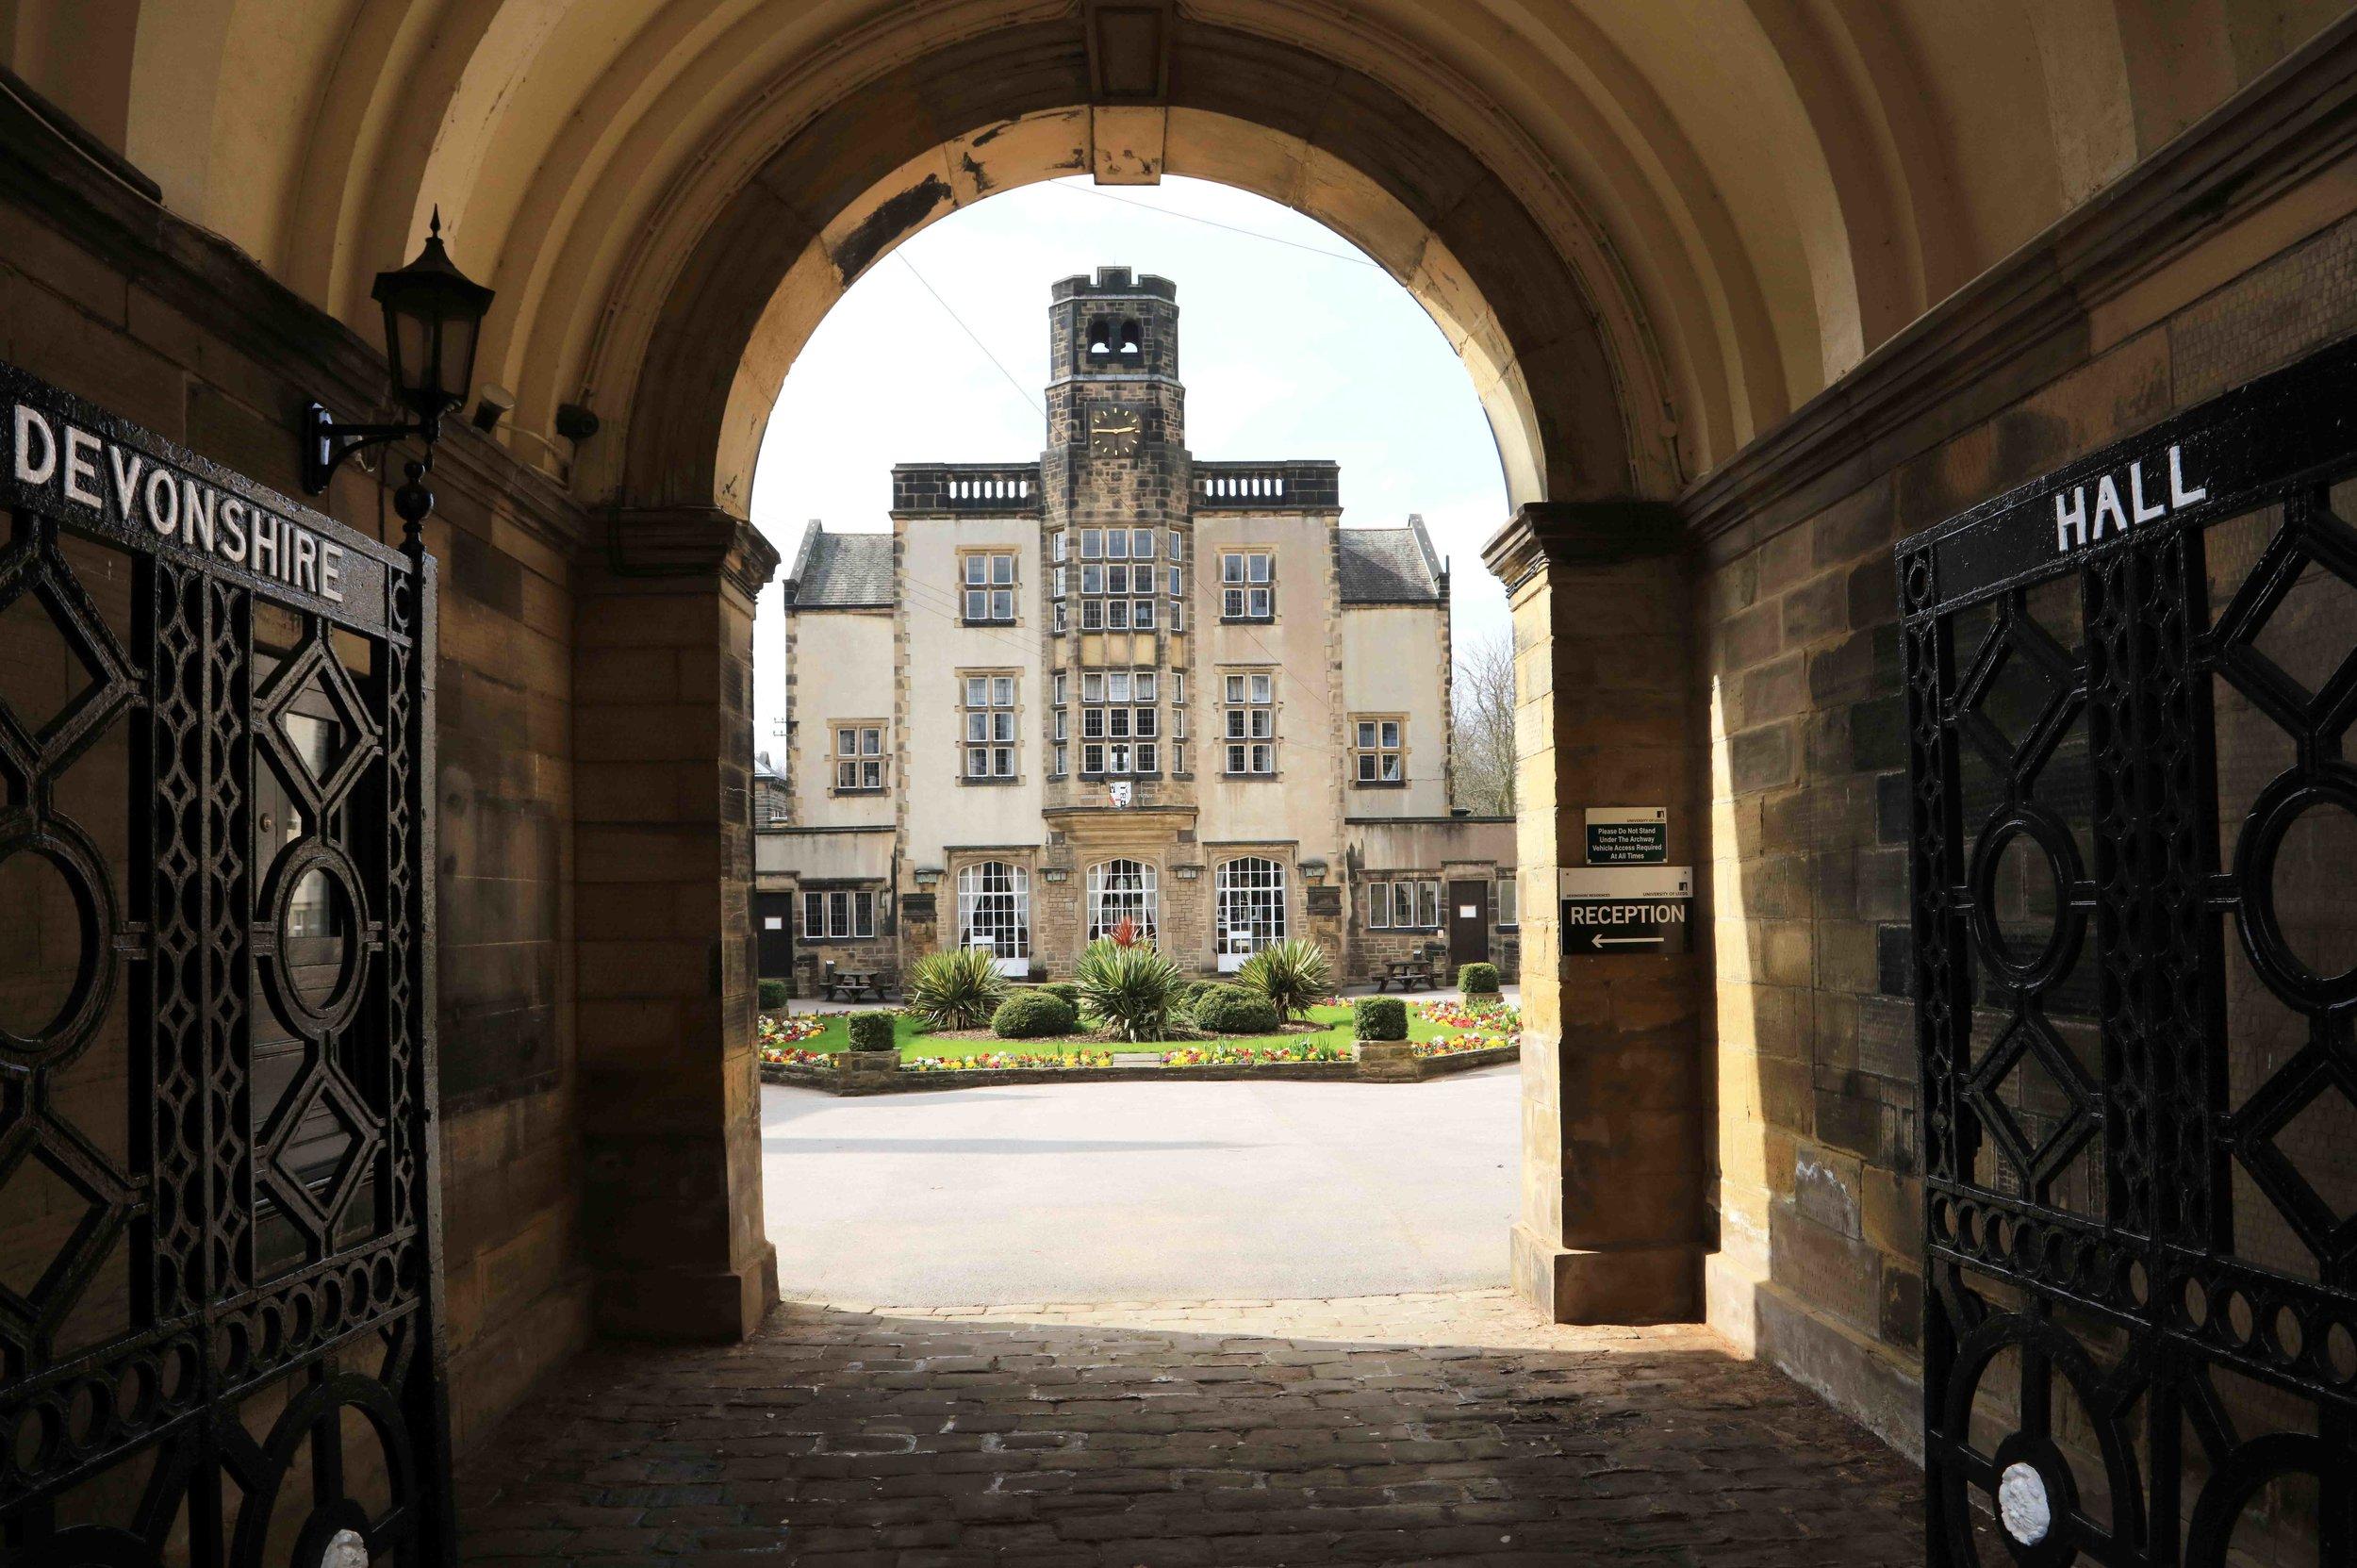 Devonshire Hall, Cumberland Road © JHJ